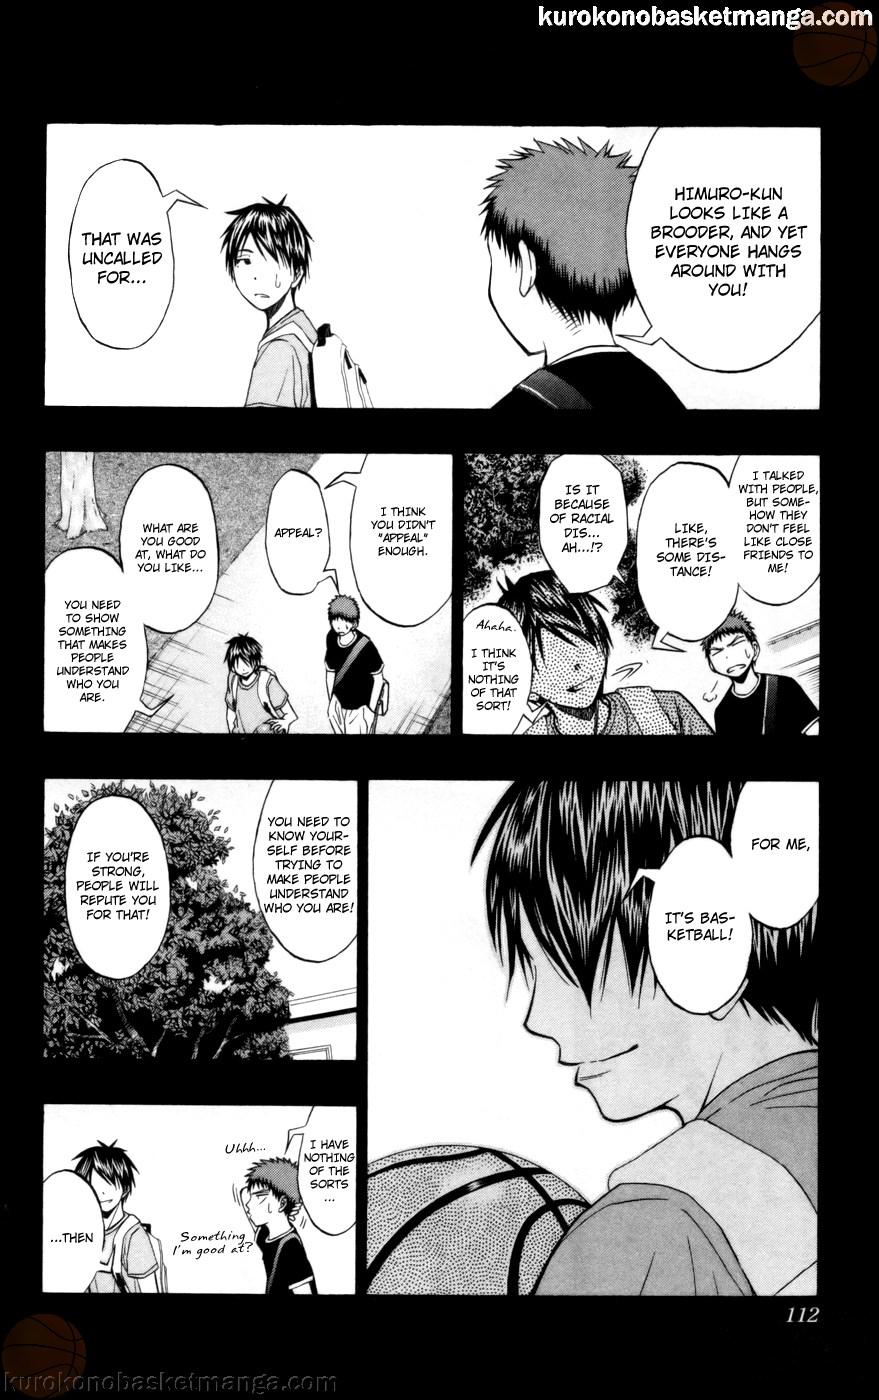 Kuroko no Basket Manga Chapter 76 - Image 06